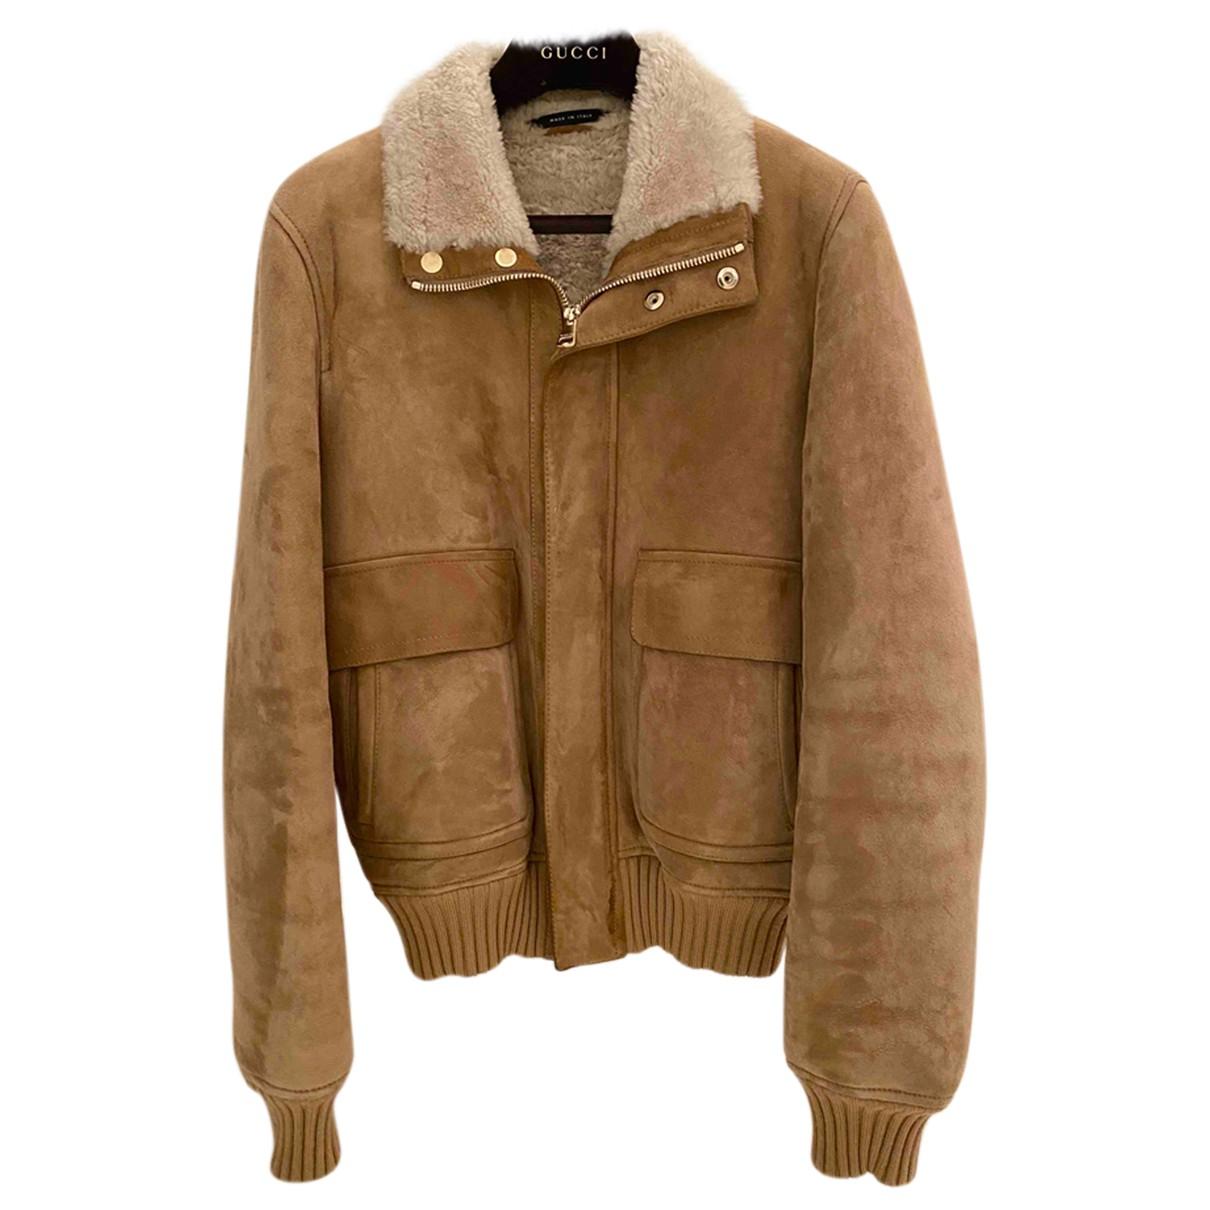 Gucci N Camel Suede jacket  for Men 48 IT